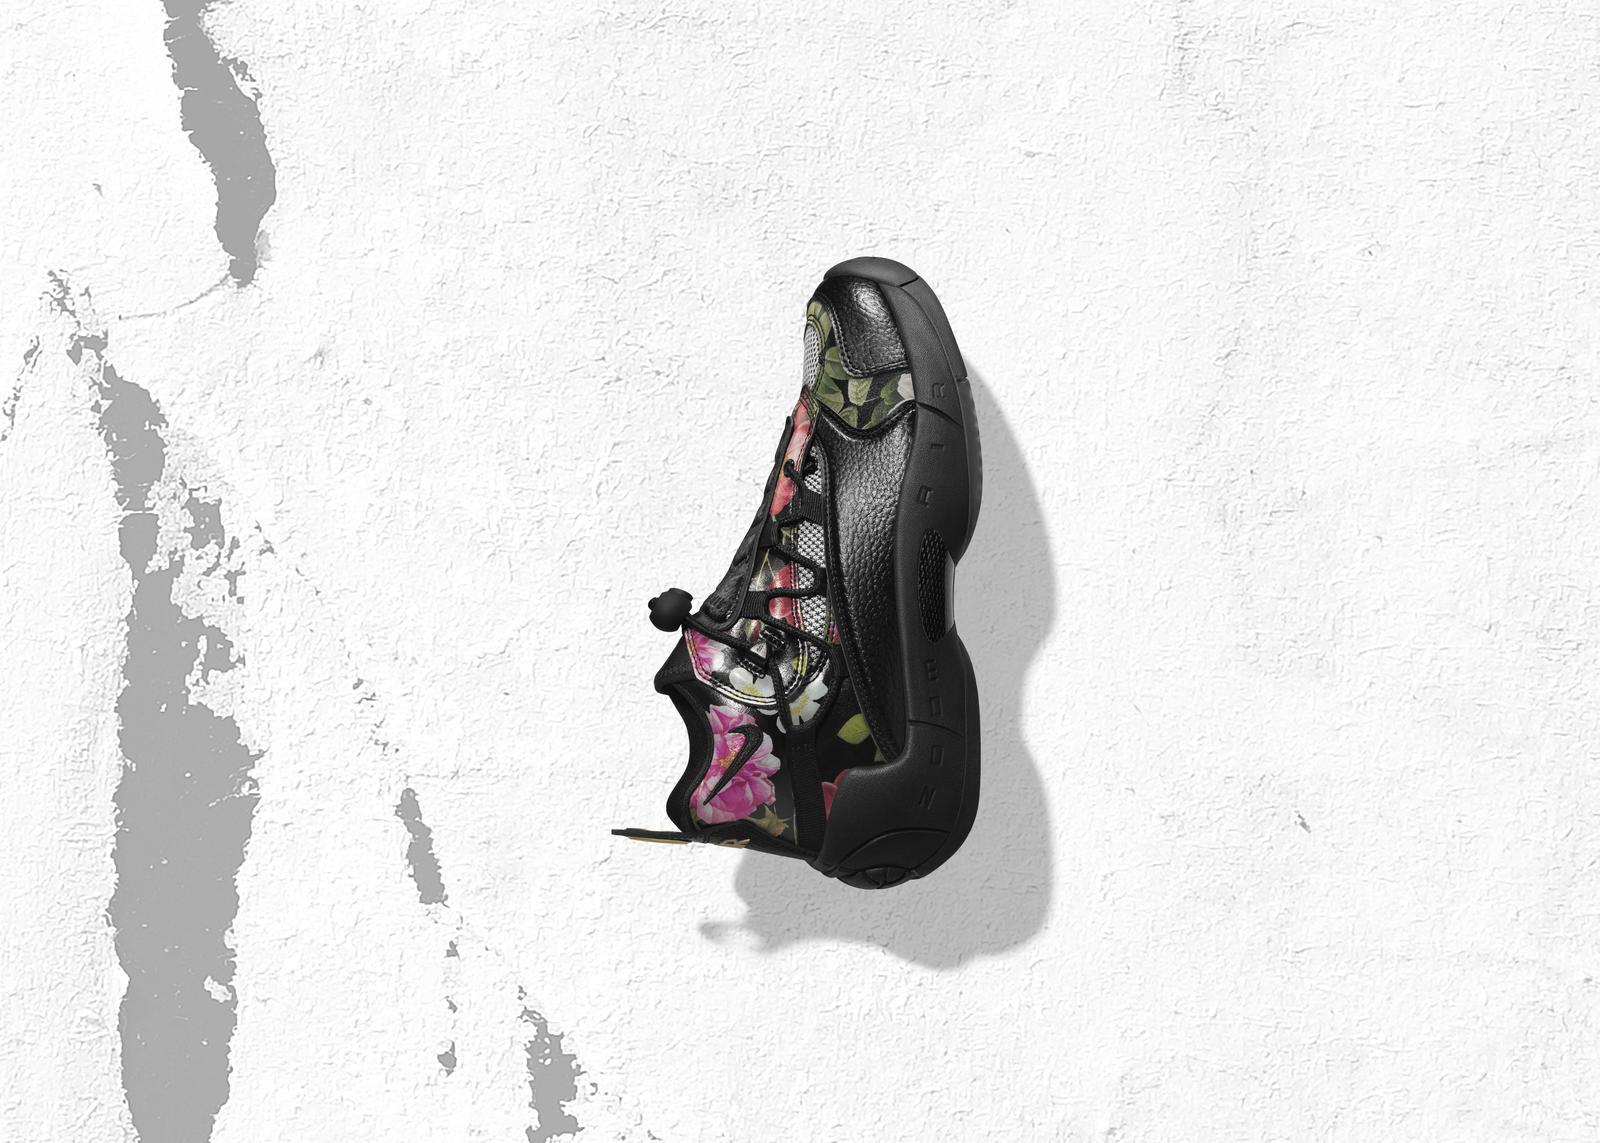 d8beabff4b4 Nike and Jordan Brand s 2019 NBA All-Star Footwear Drops - Nike News